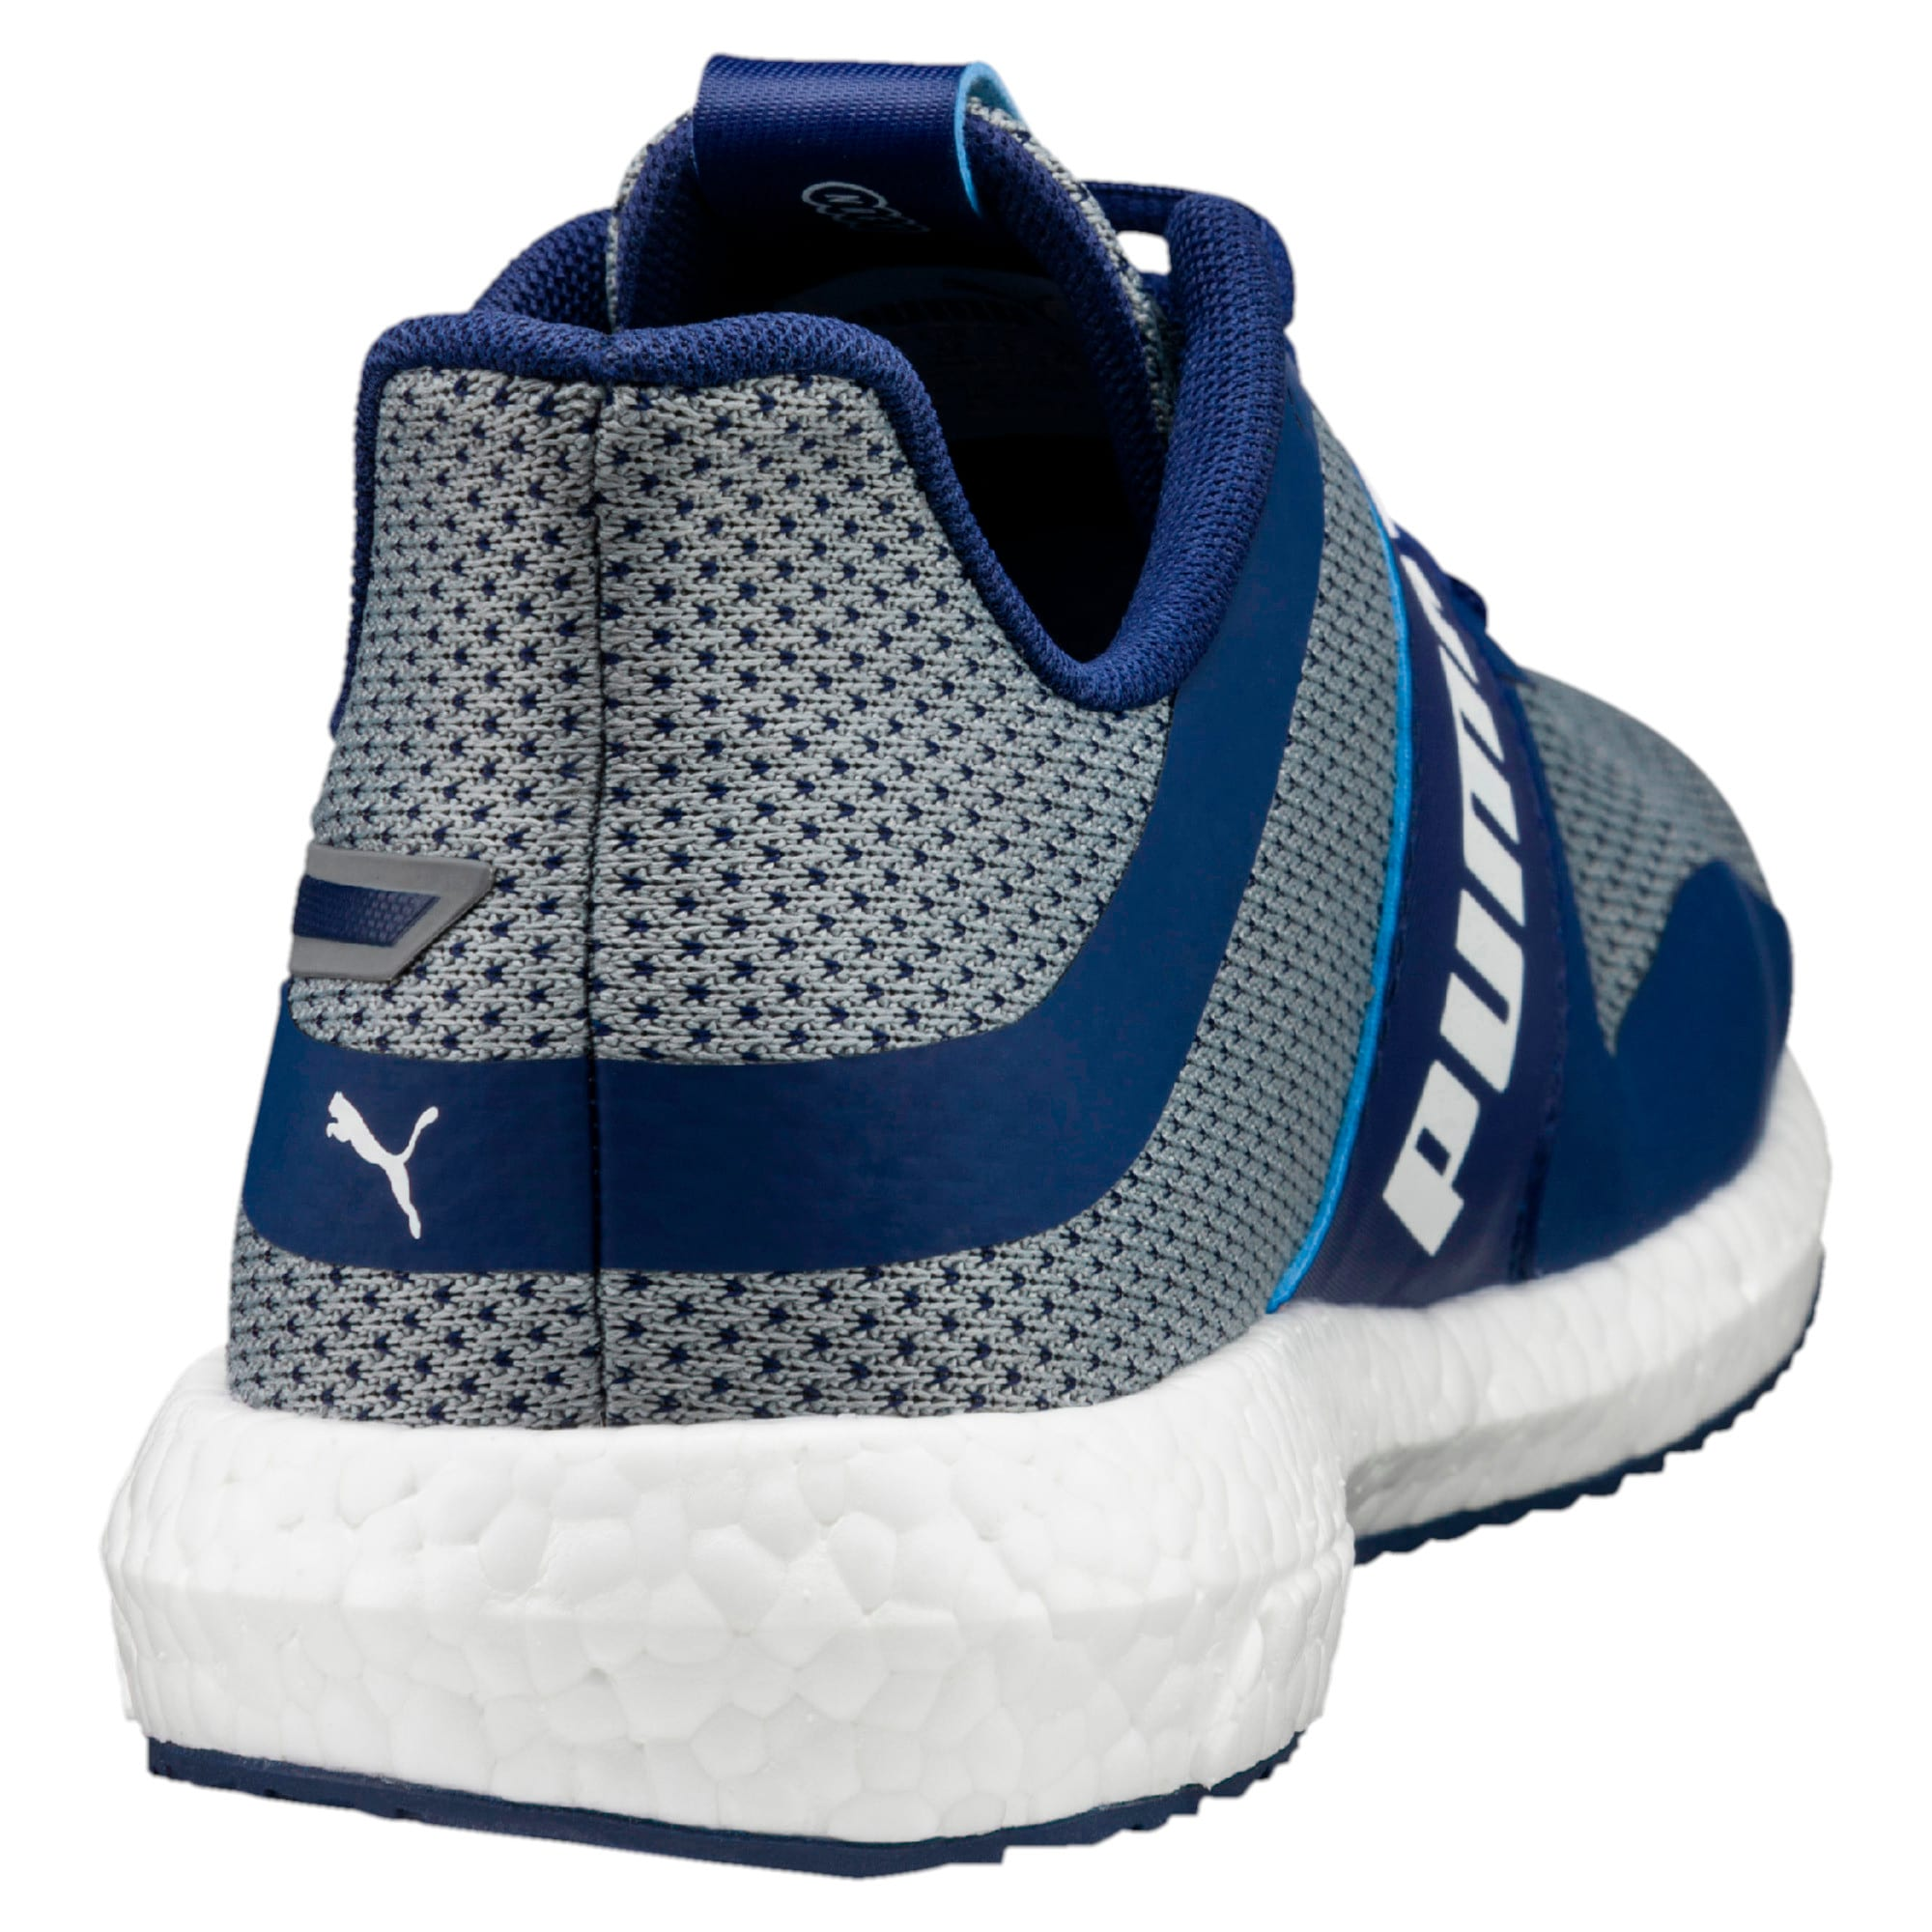 Thumbnail 3 of Mega NRGY Turbo Men's Running Shoes, Blue Depths-Puma White, medium-IND